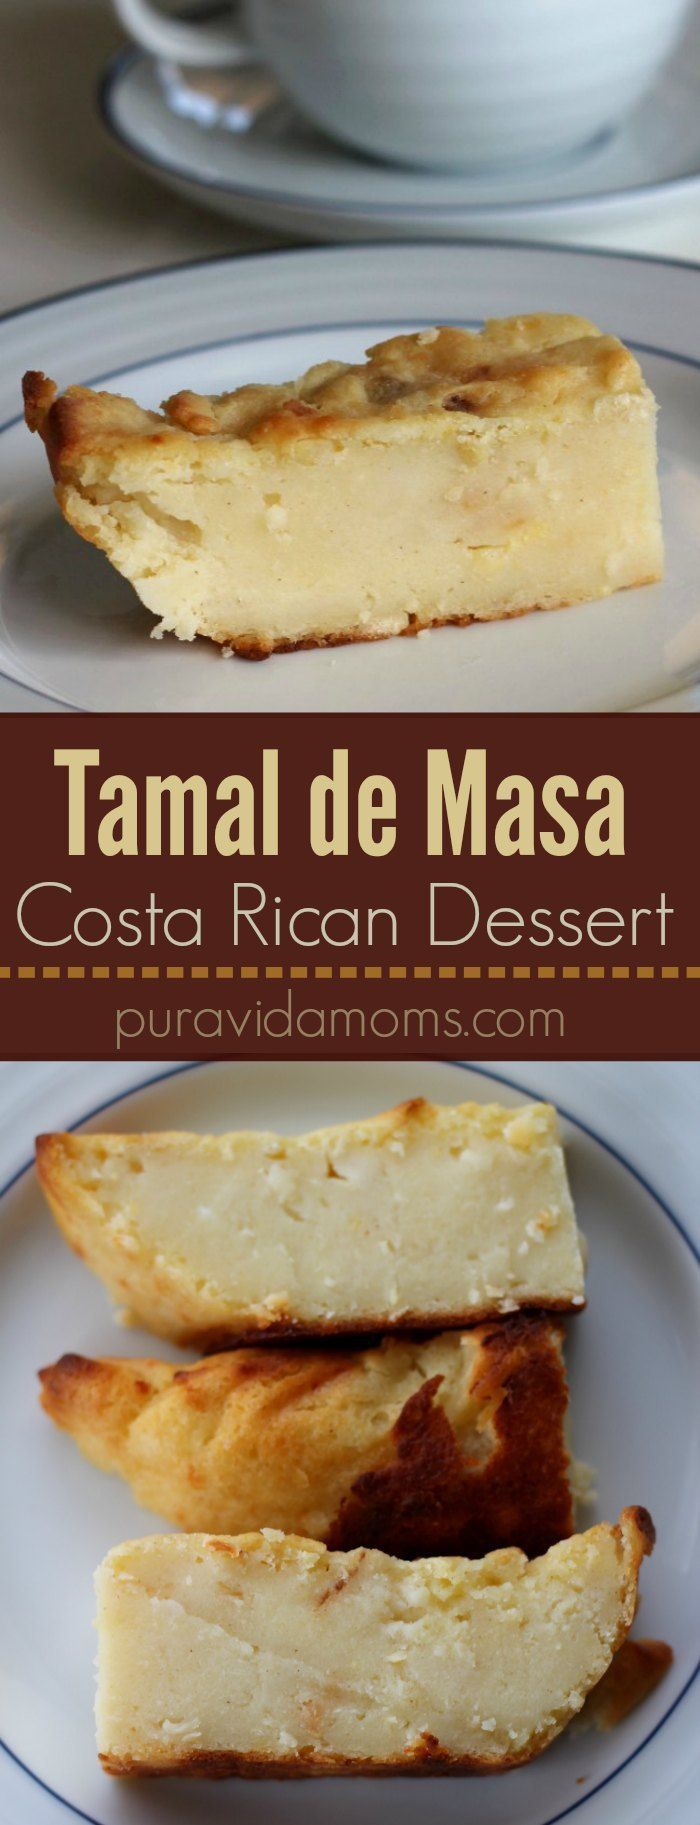 Tamal de Masa Costa Rican Dessert